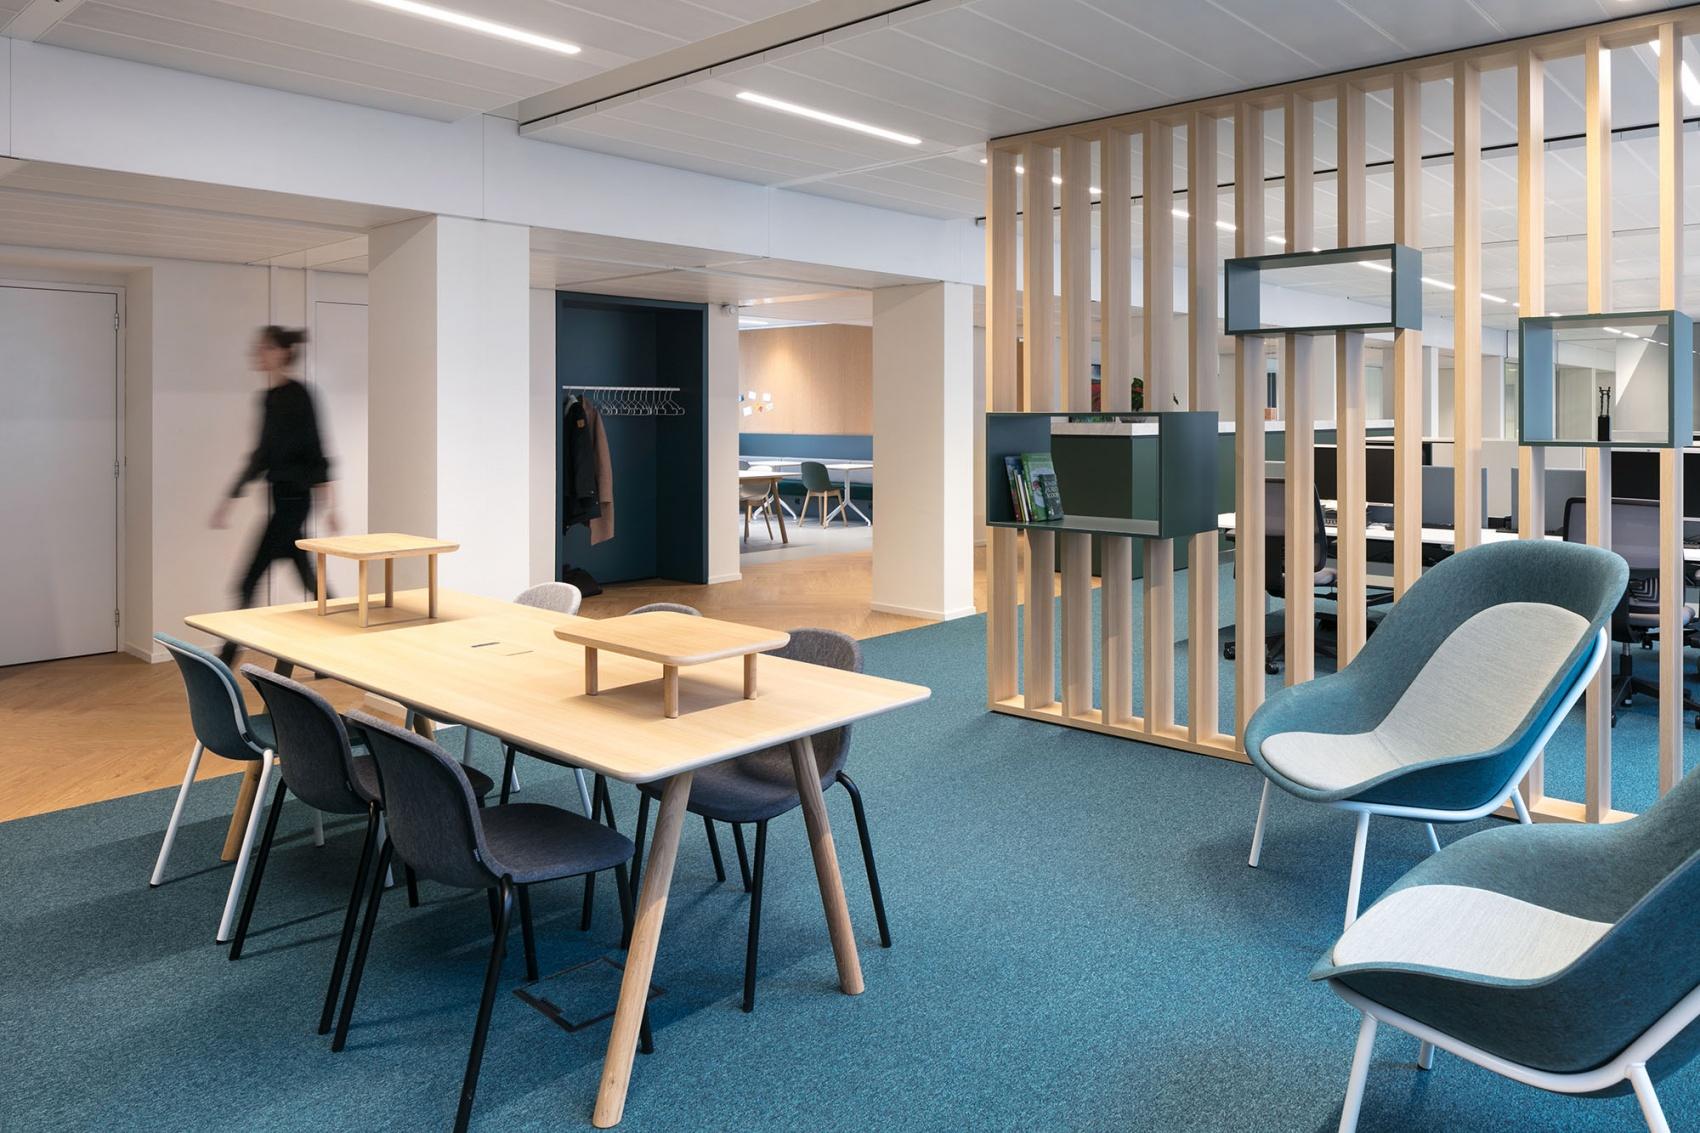 De Vorm on Office Design - LTO Project